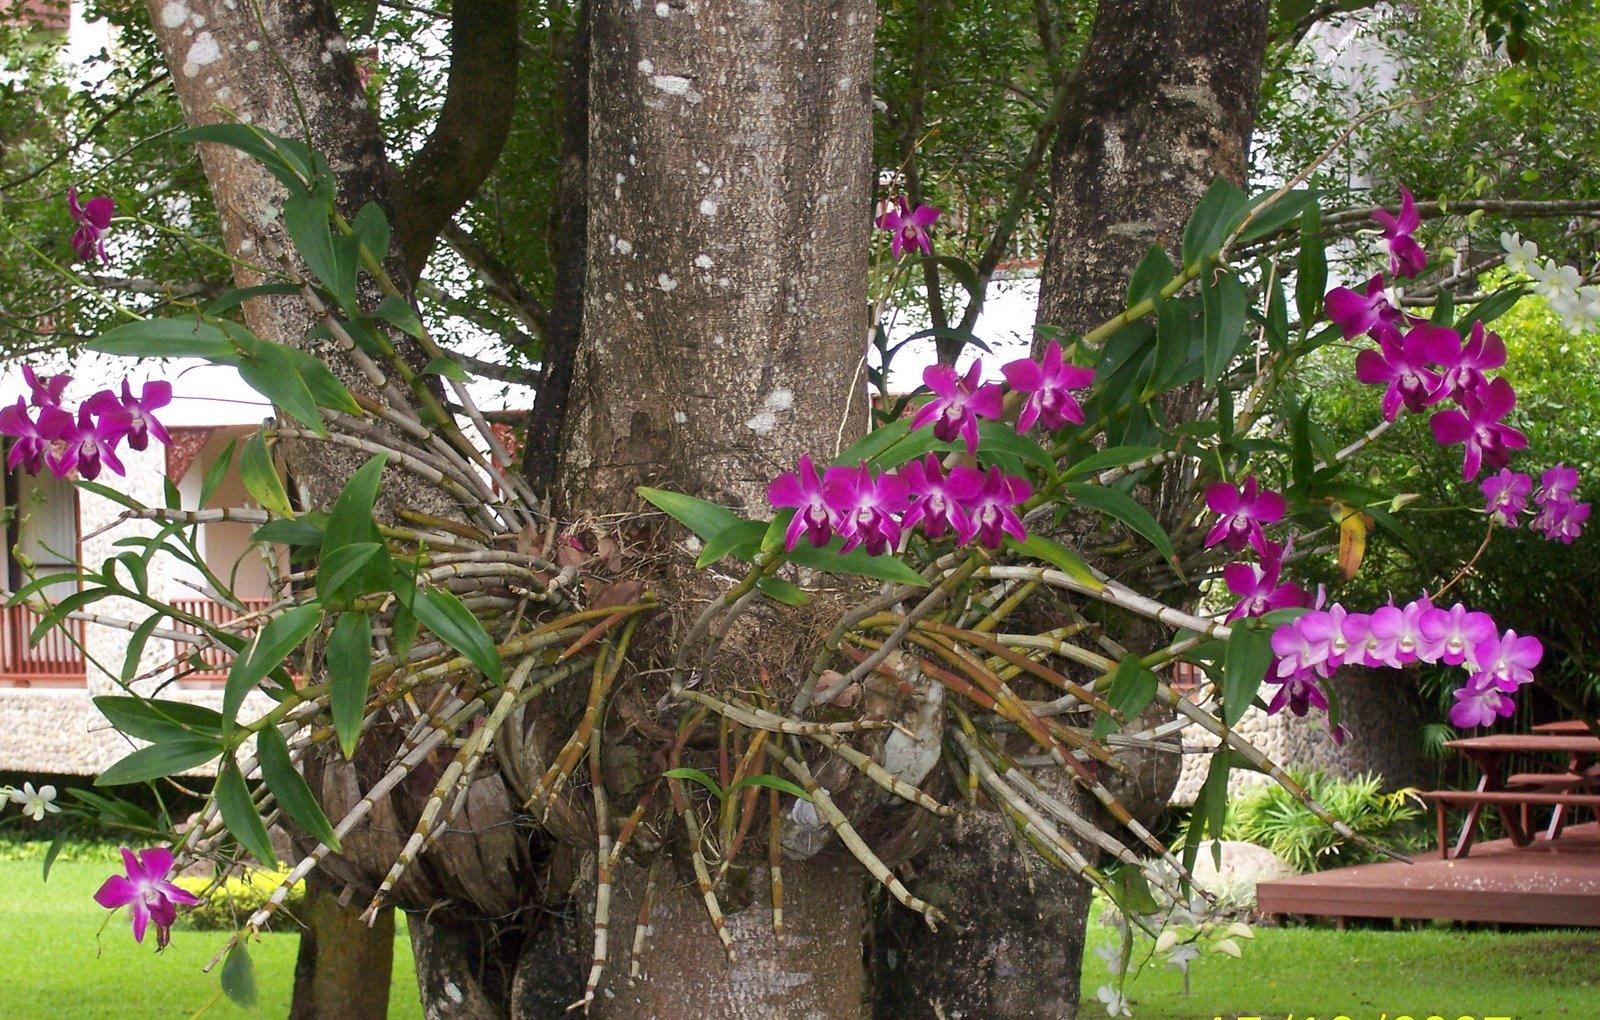 Orquídea epífita - em árvore